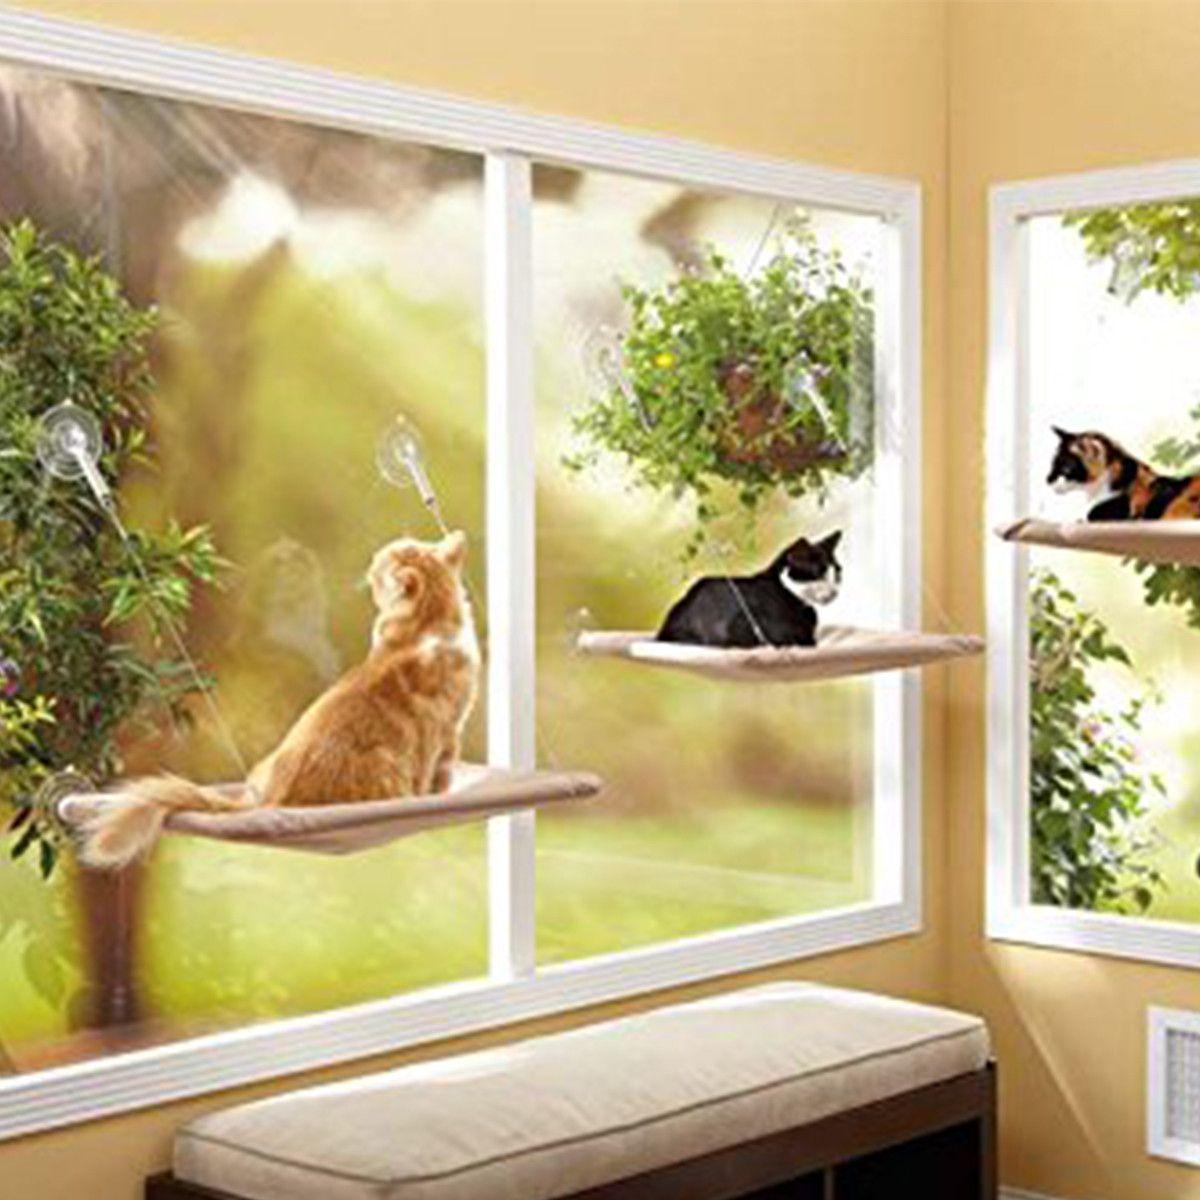 Pet Clever Window Mounted Bed Cat Window Cat Bed Cat Window Bed